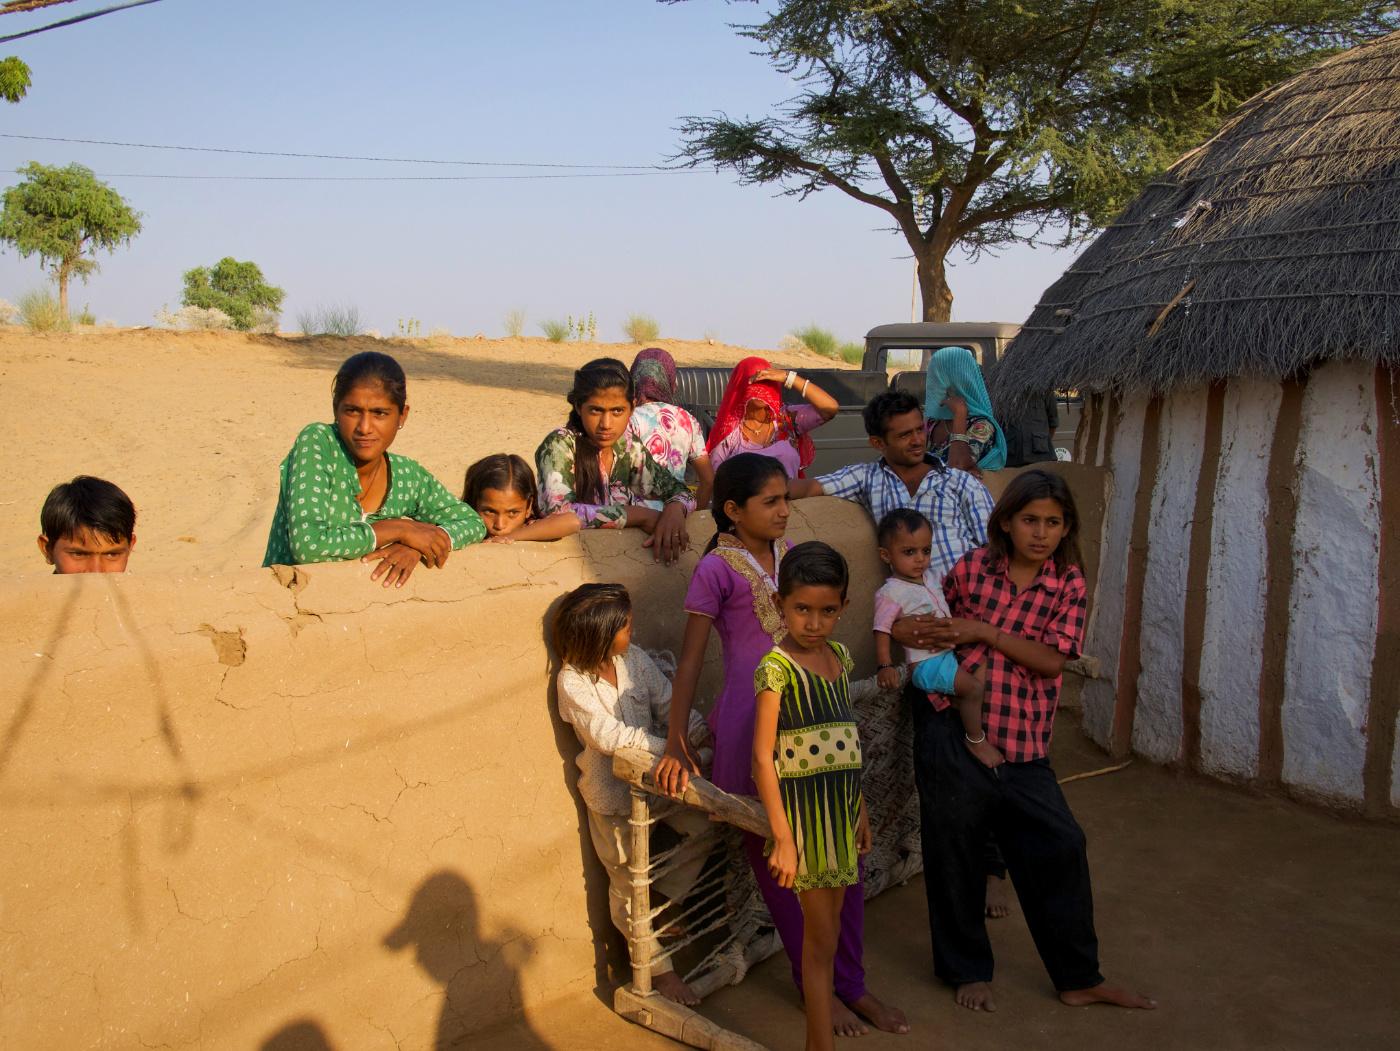 480-India-TharDesert